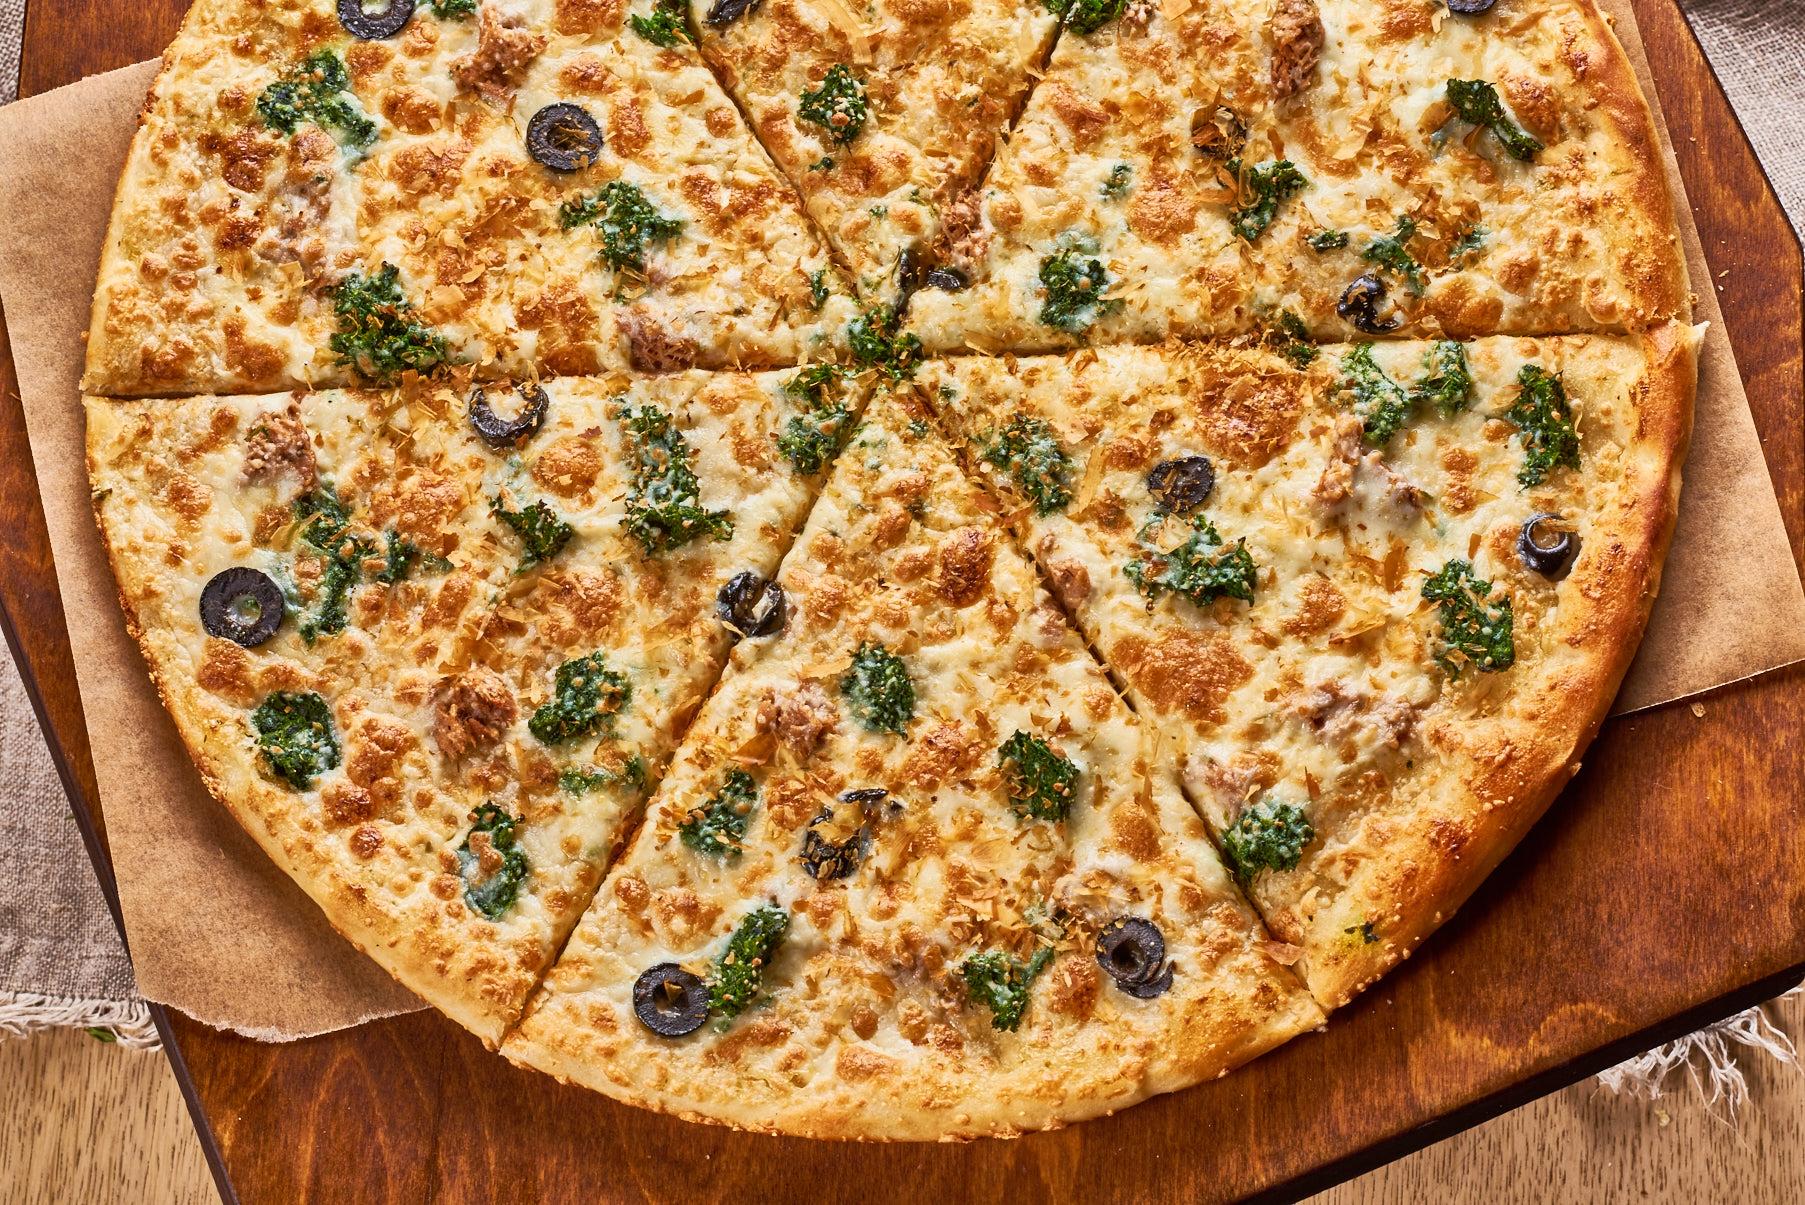 С КУРИЦЕЙ И ШПИНАТОМ *26 сантиметров Palermo Pizza | Пиццерия Палермо Пицца Palermo Доставка Волгоград